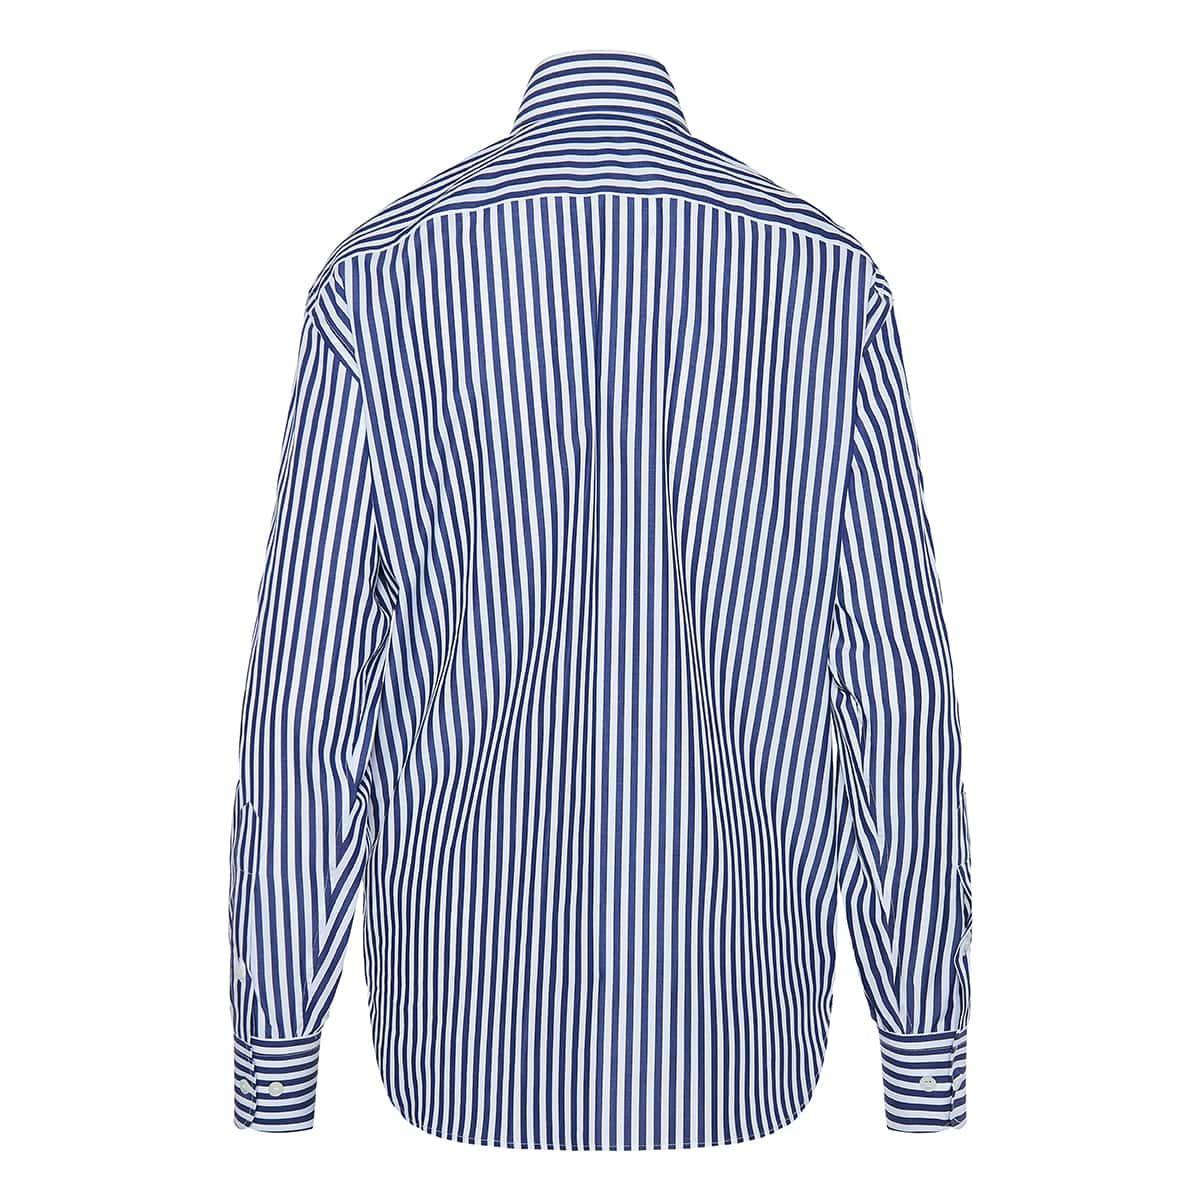 Signature oversized striped shirt